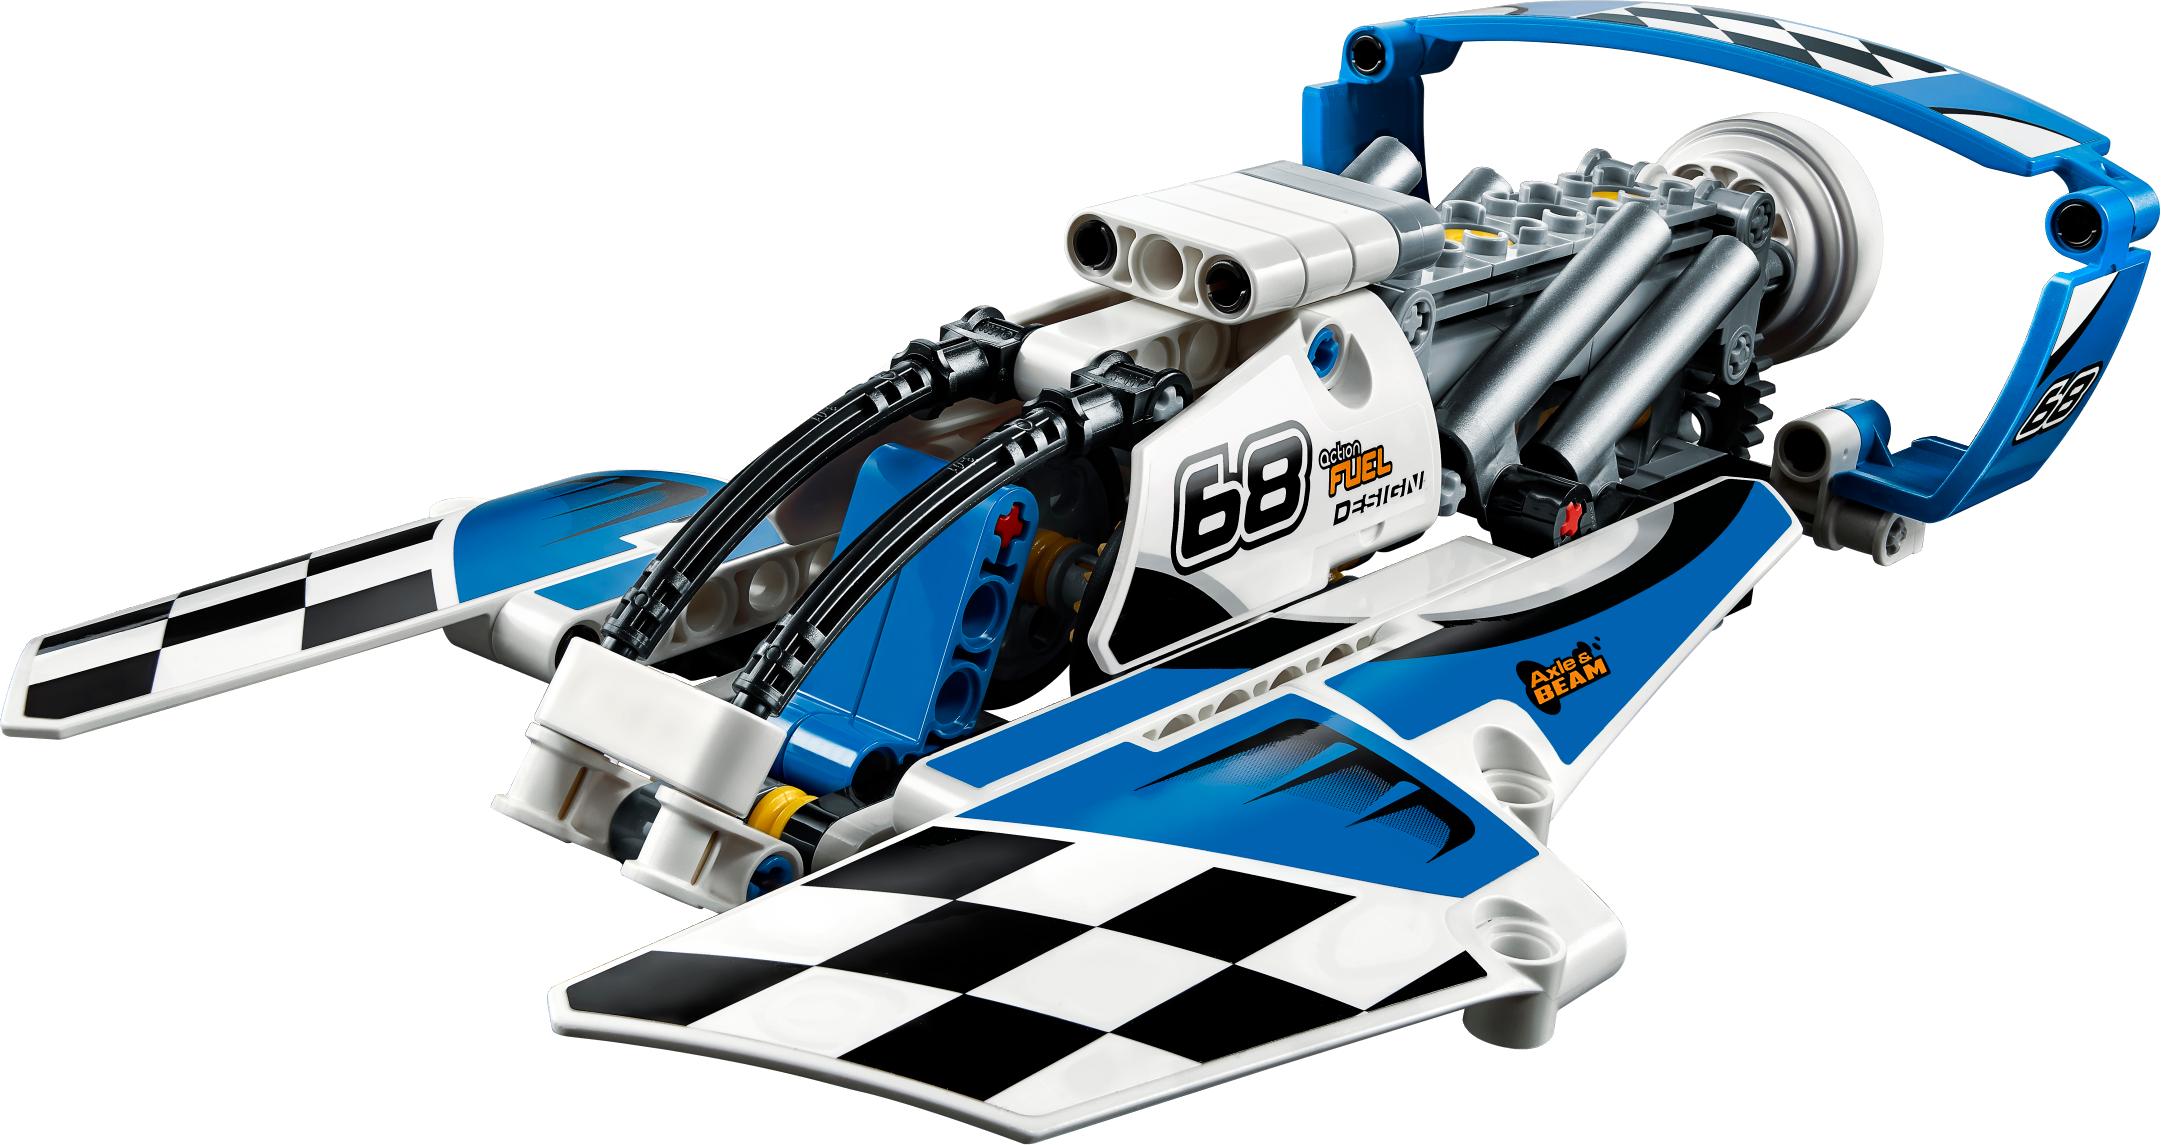 Hydroplane Racer